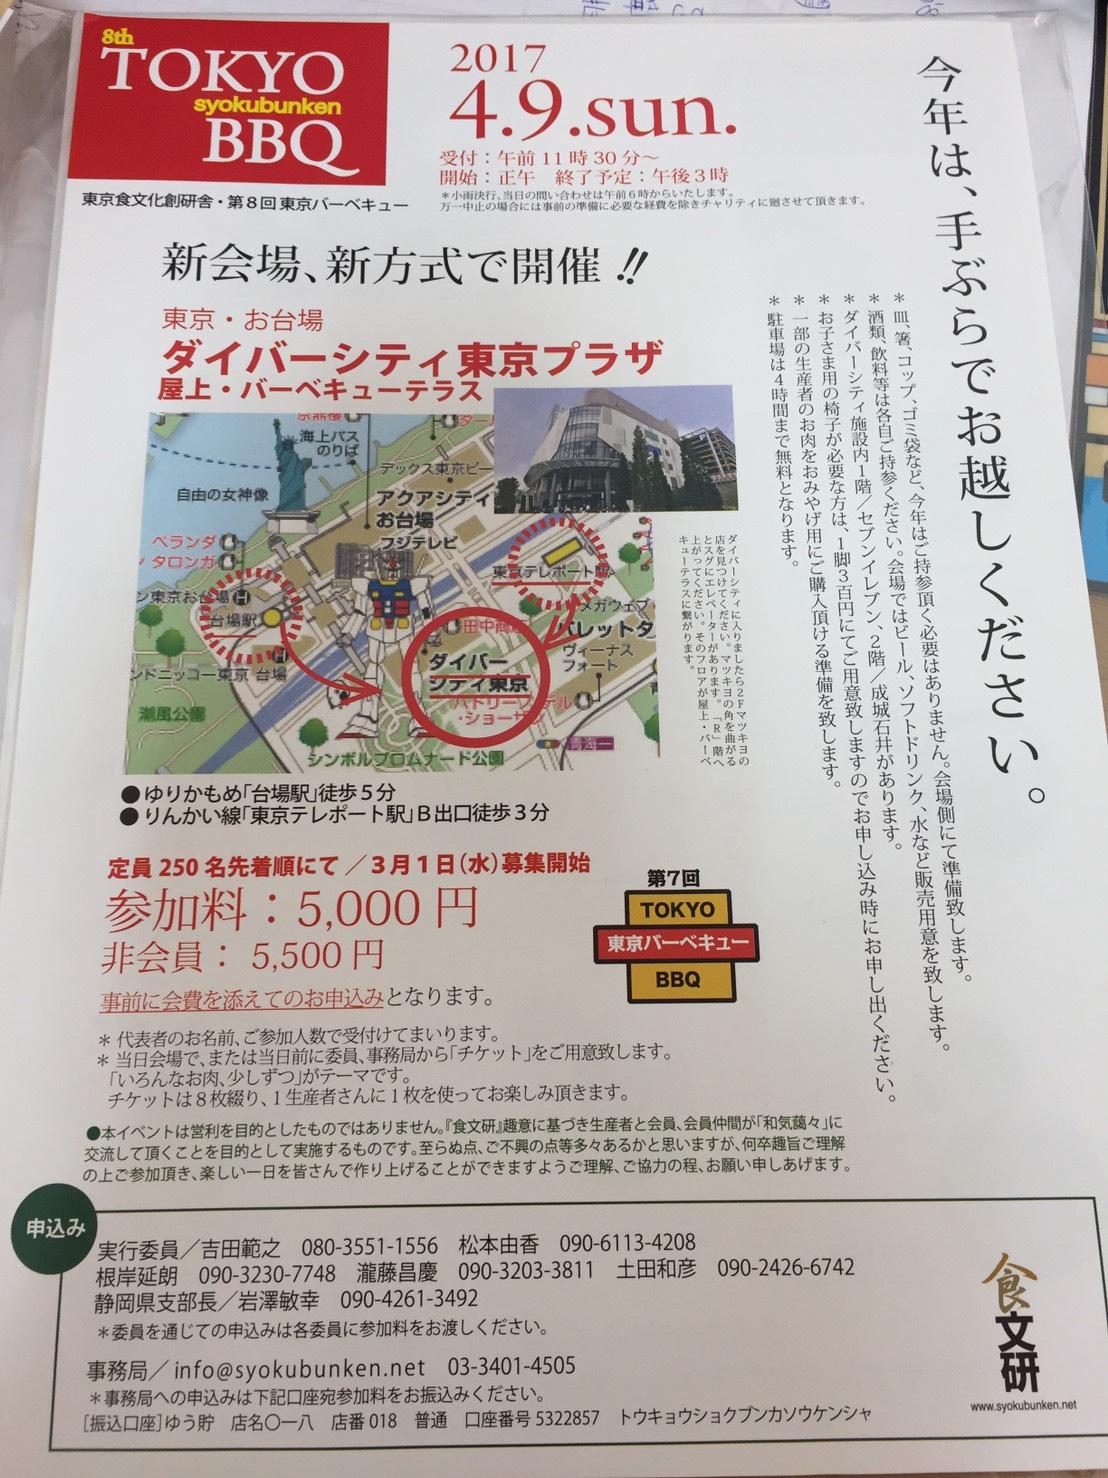 4/9 TOKYO BBQ 参加のお知らせ